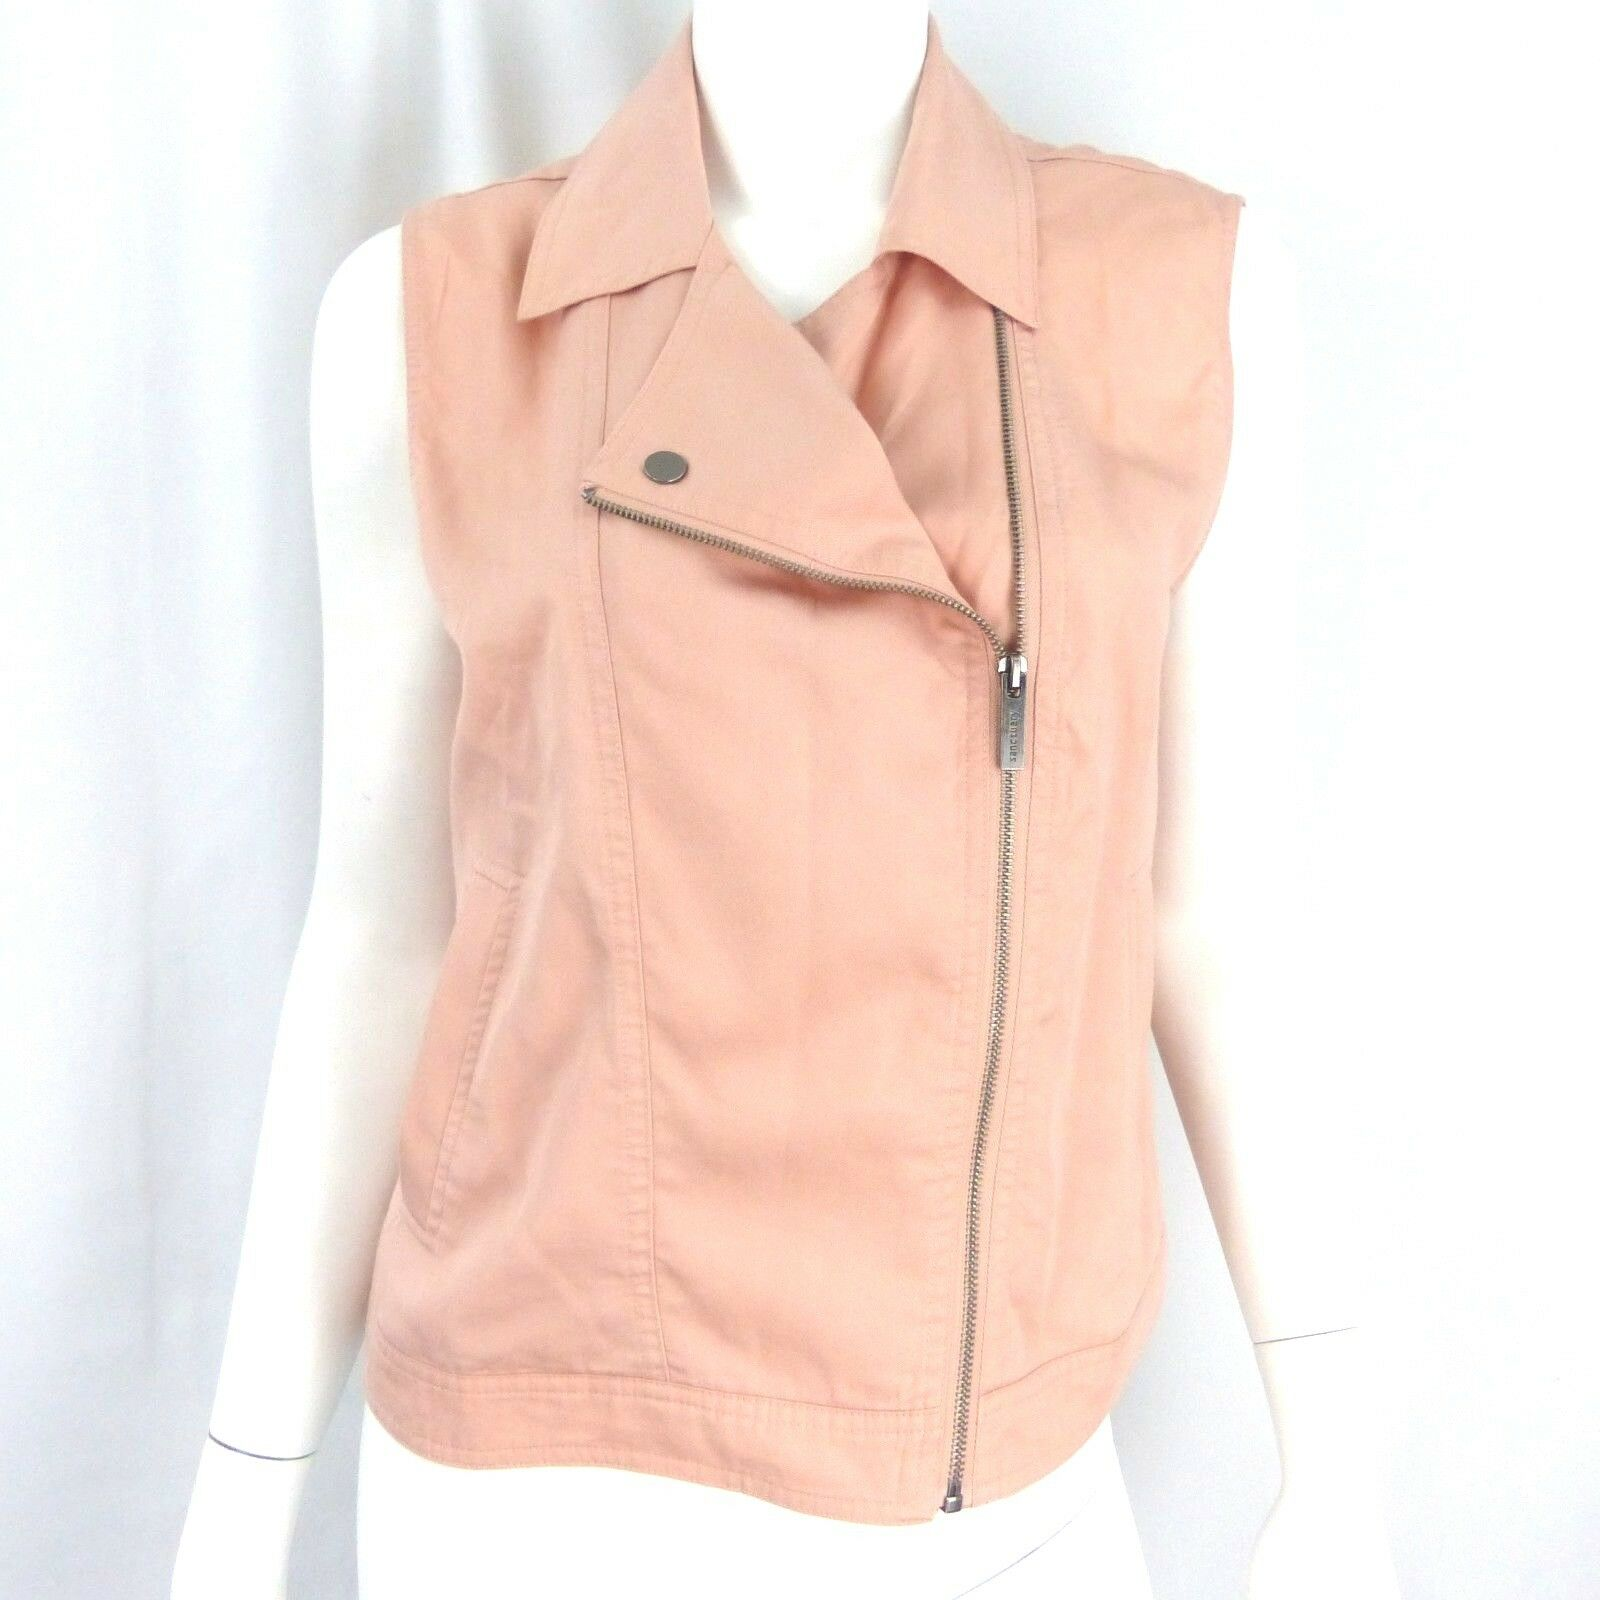 Sanctuary Women's Tencel Moto Vest bluesh Pink Size M NWT  Zipper Collar